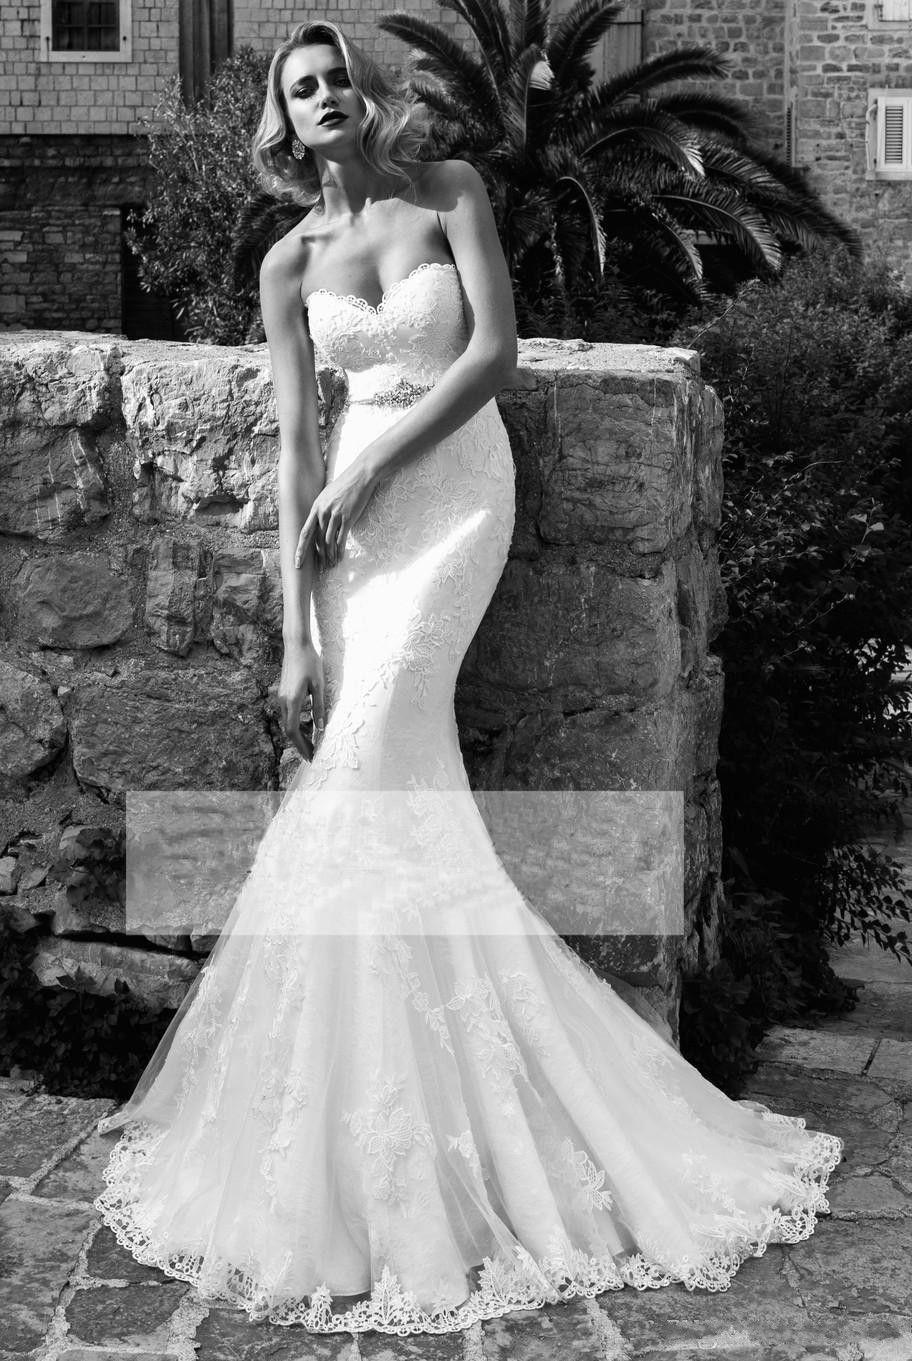 2020 sexy en dentelle de mariée sirène Robe bustier perlé Applique cristal Ceinture Corset Sexy Plus Size Robes de mariée Modest robes de mariée BA7406